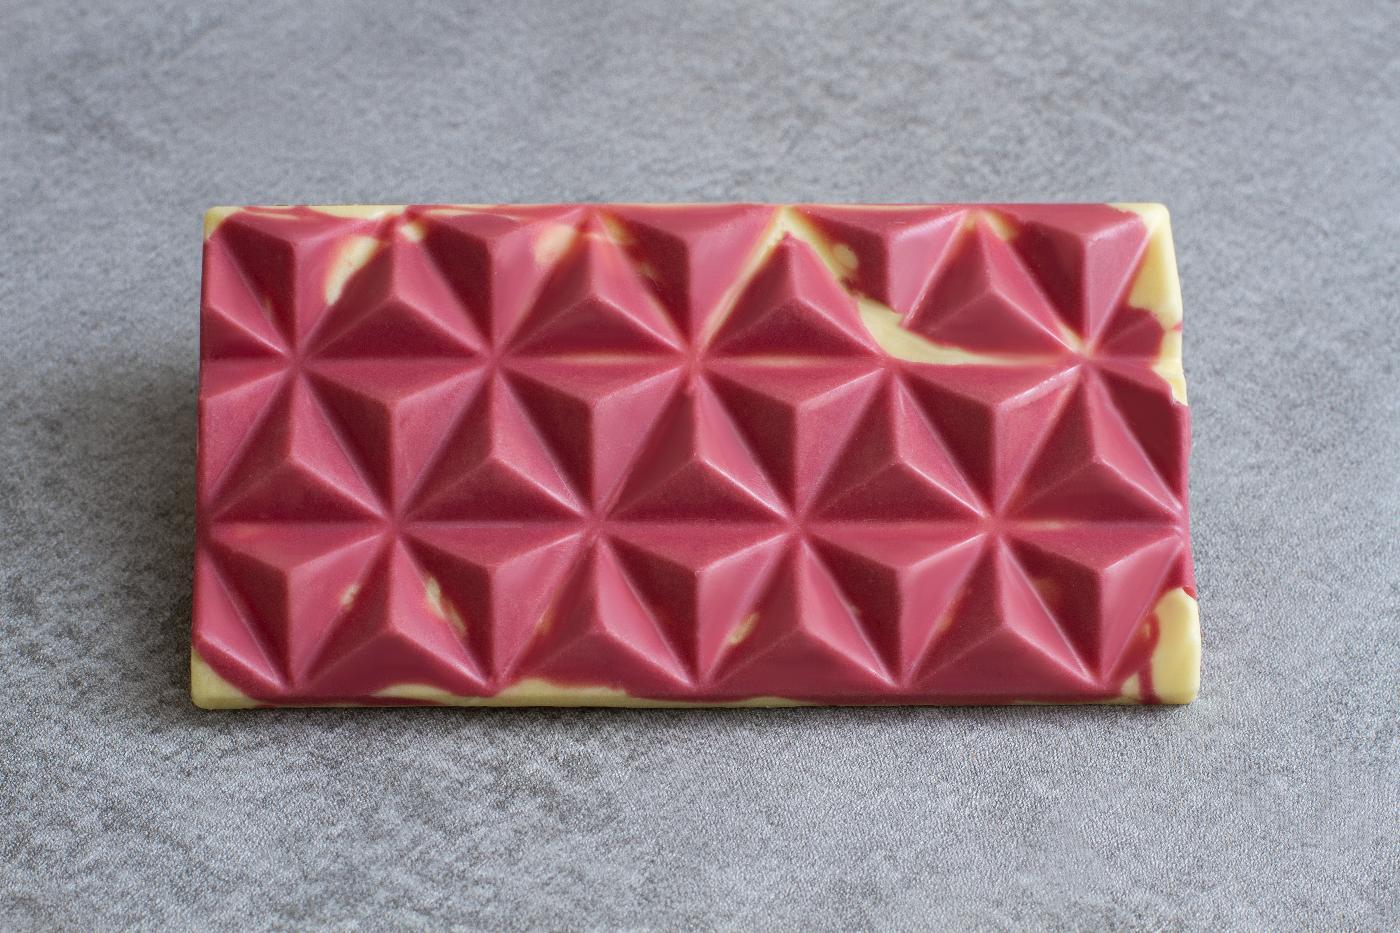 Ruby-White Pyramid Bar